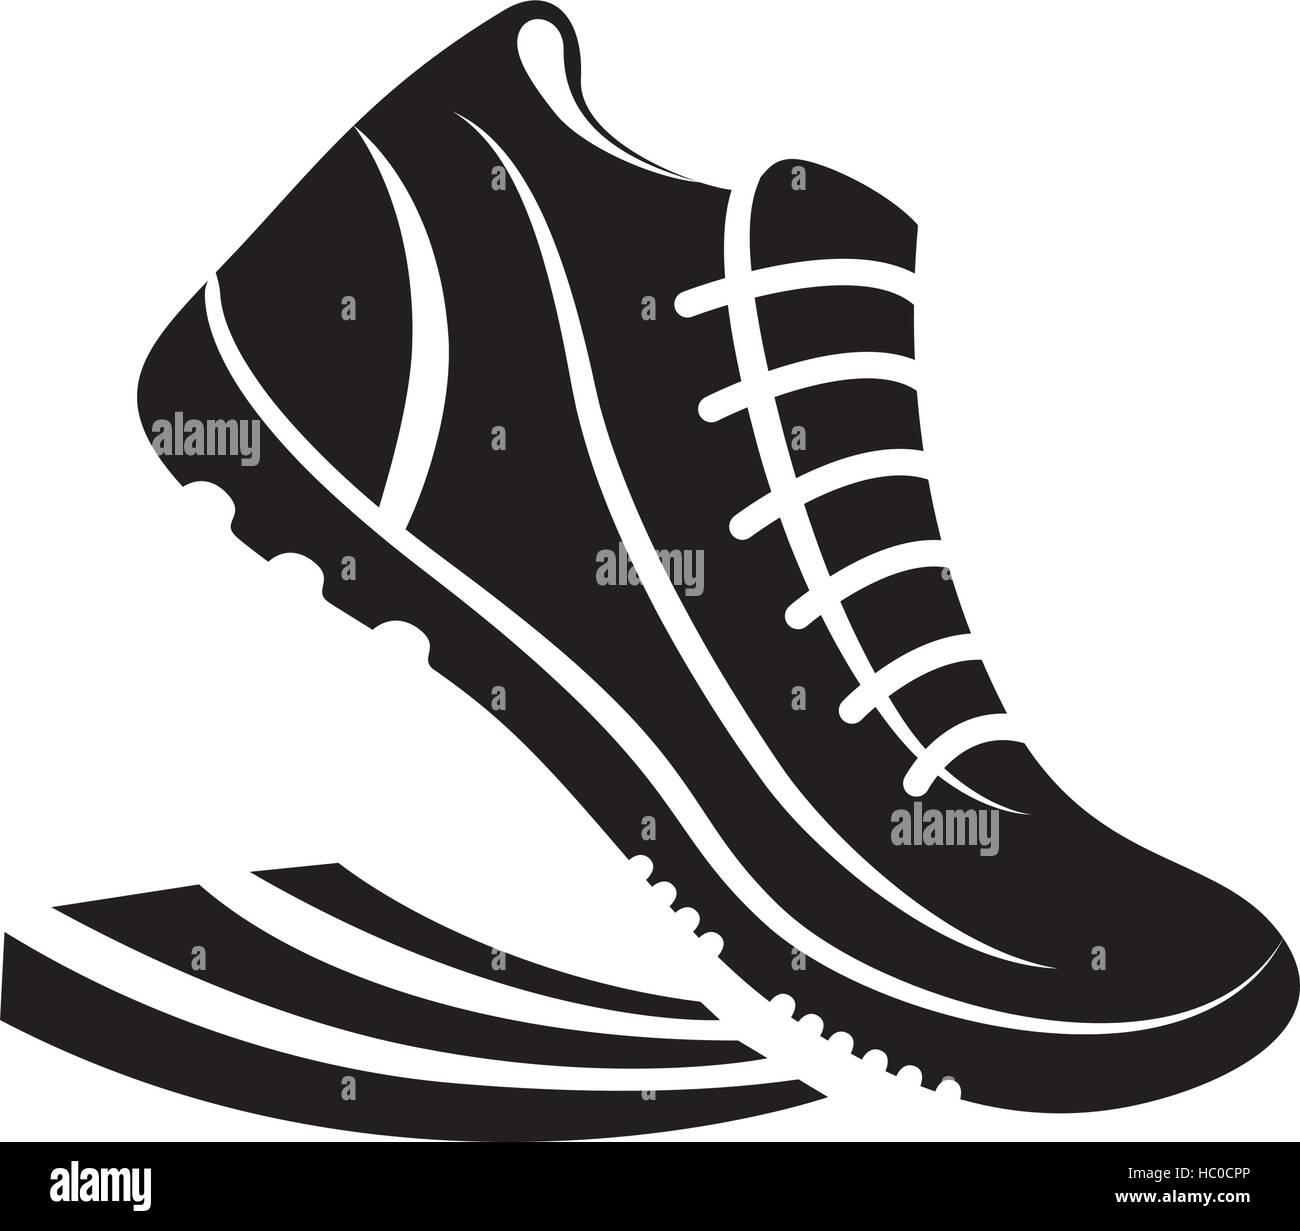 Vektor Grafik Piktogramm Symbol Schuhe mit Illustration OPuXTikZ